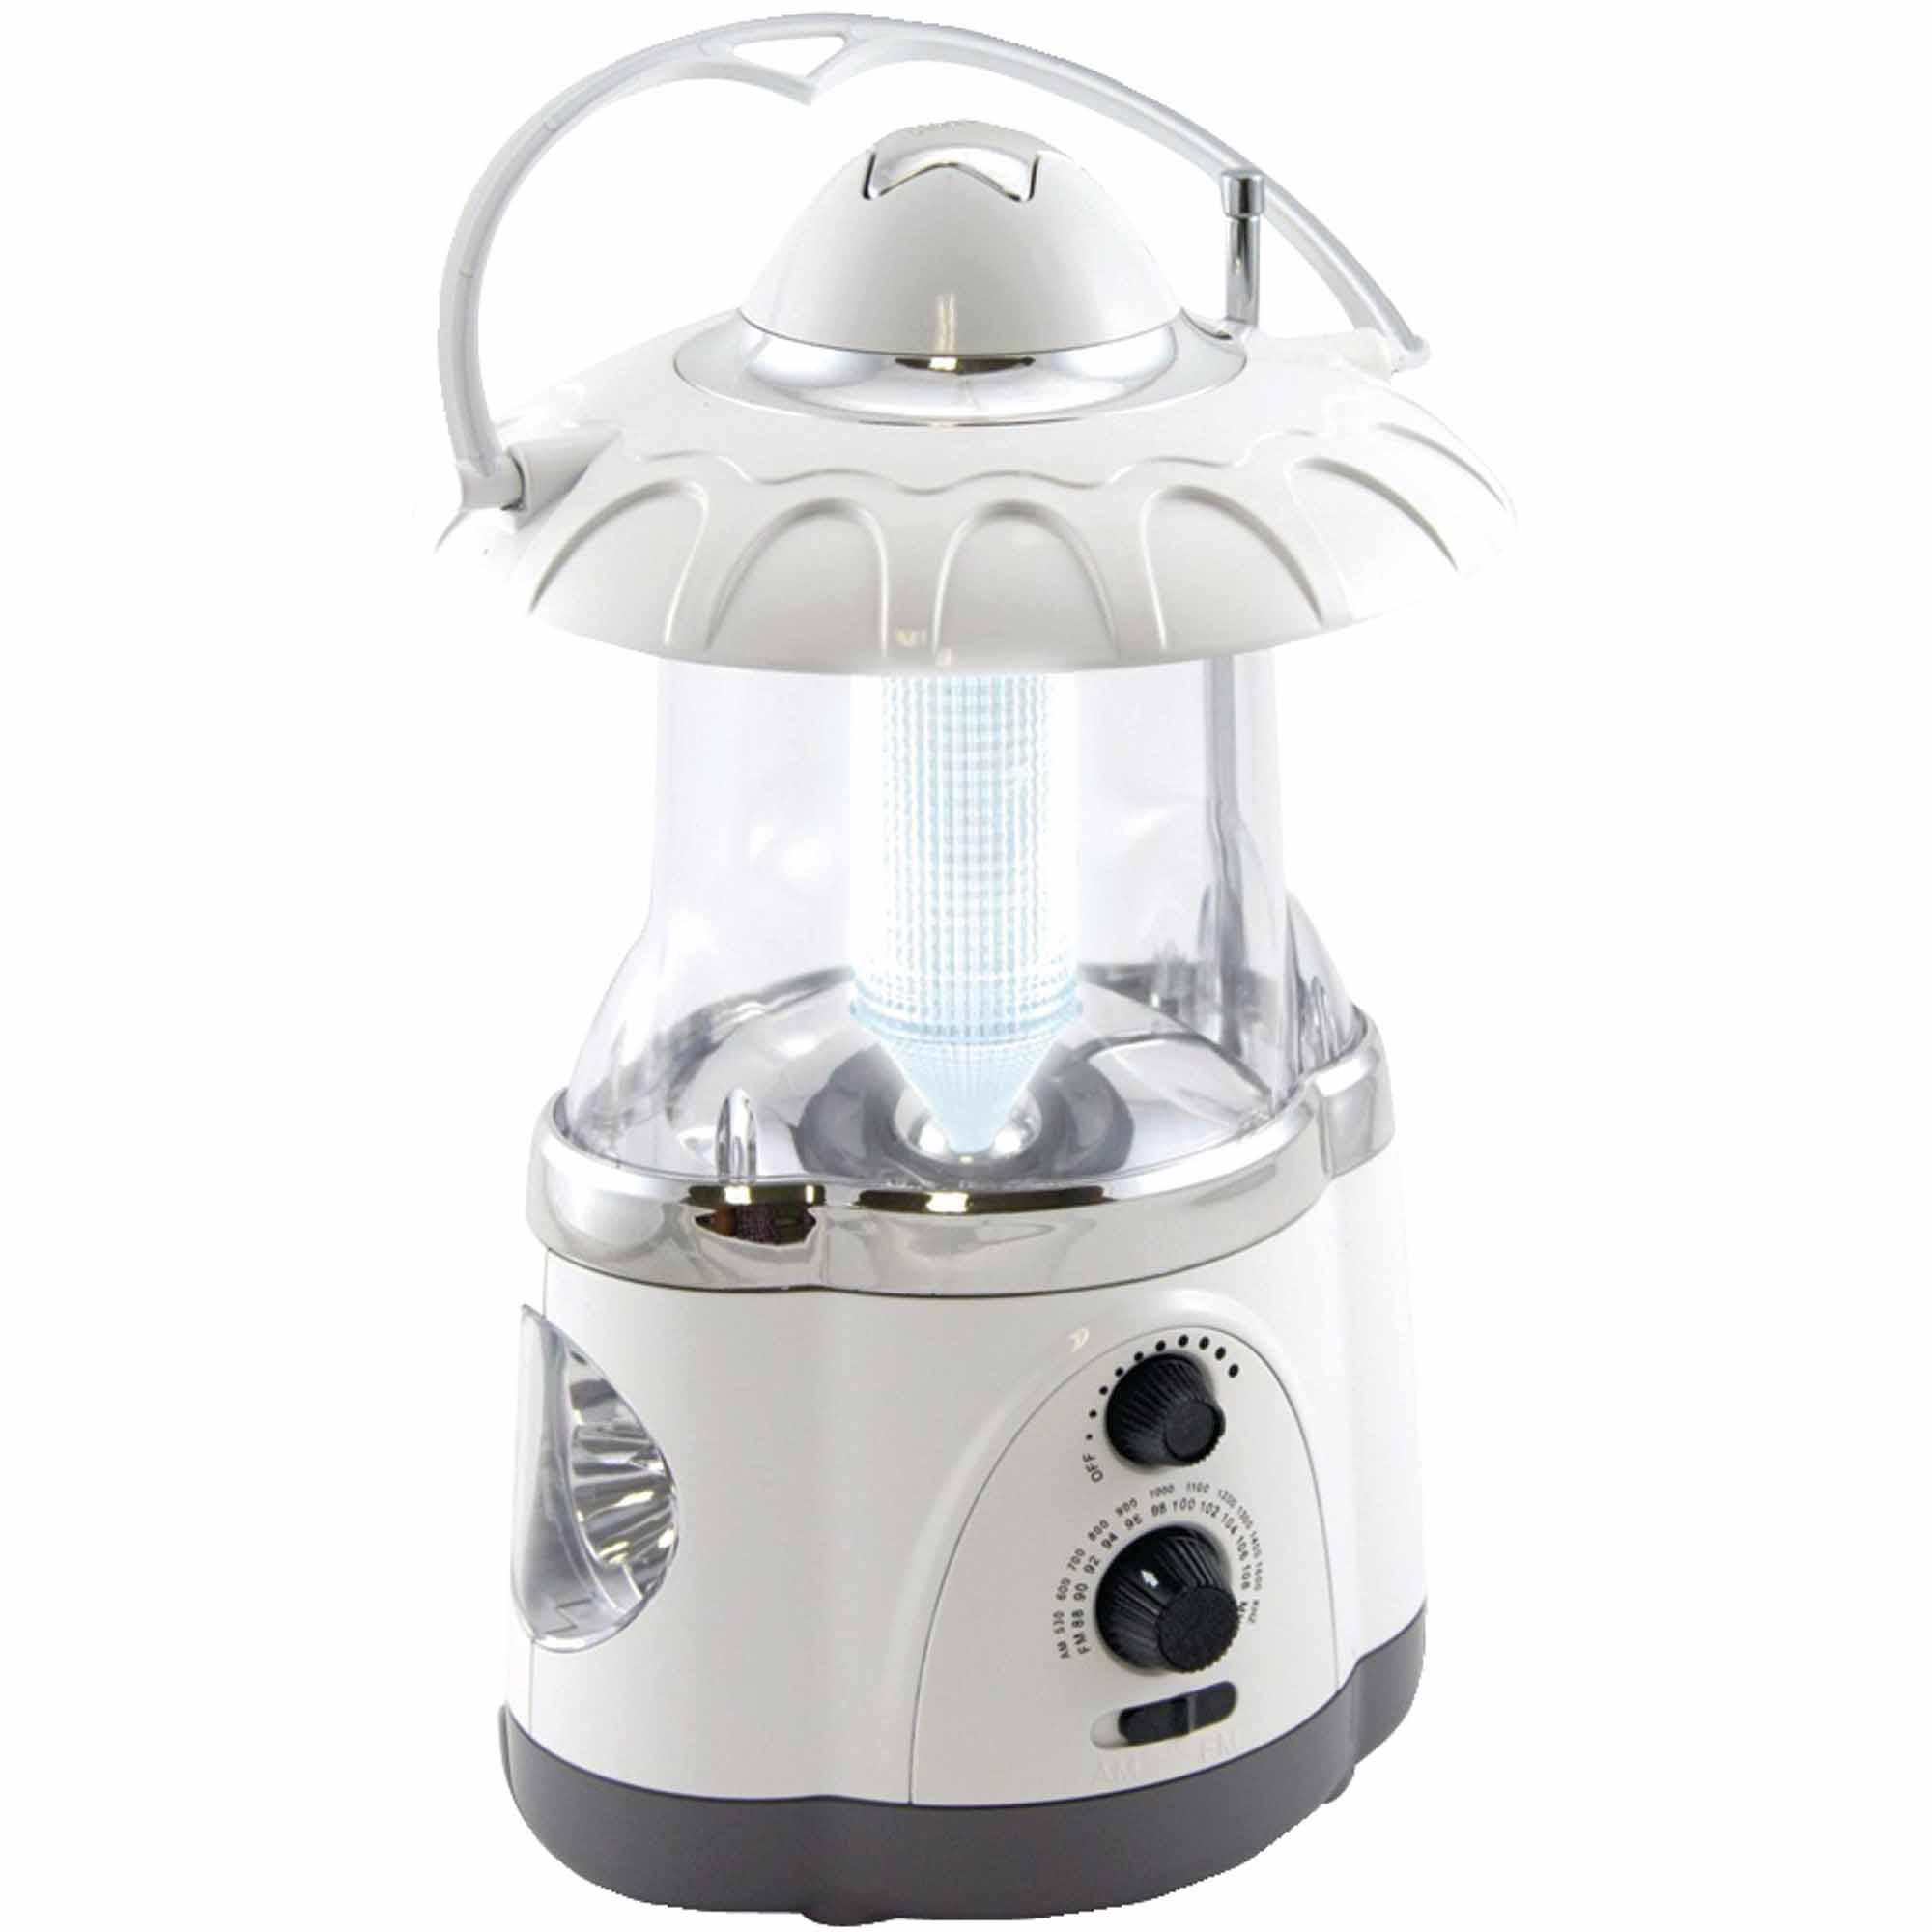 Northpoint 12-LED White Lantern with 4-LED Flashlight and AM/FM Radio